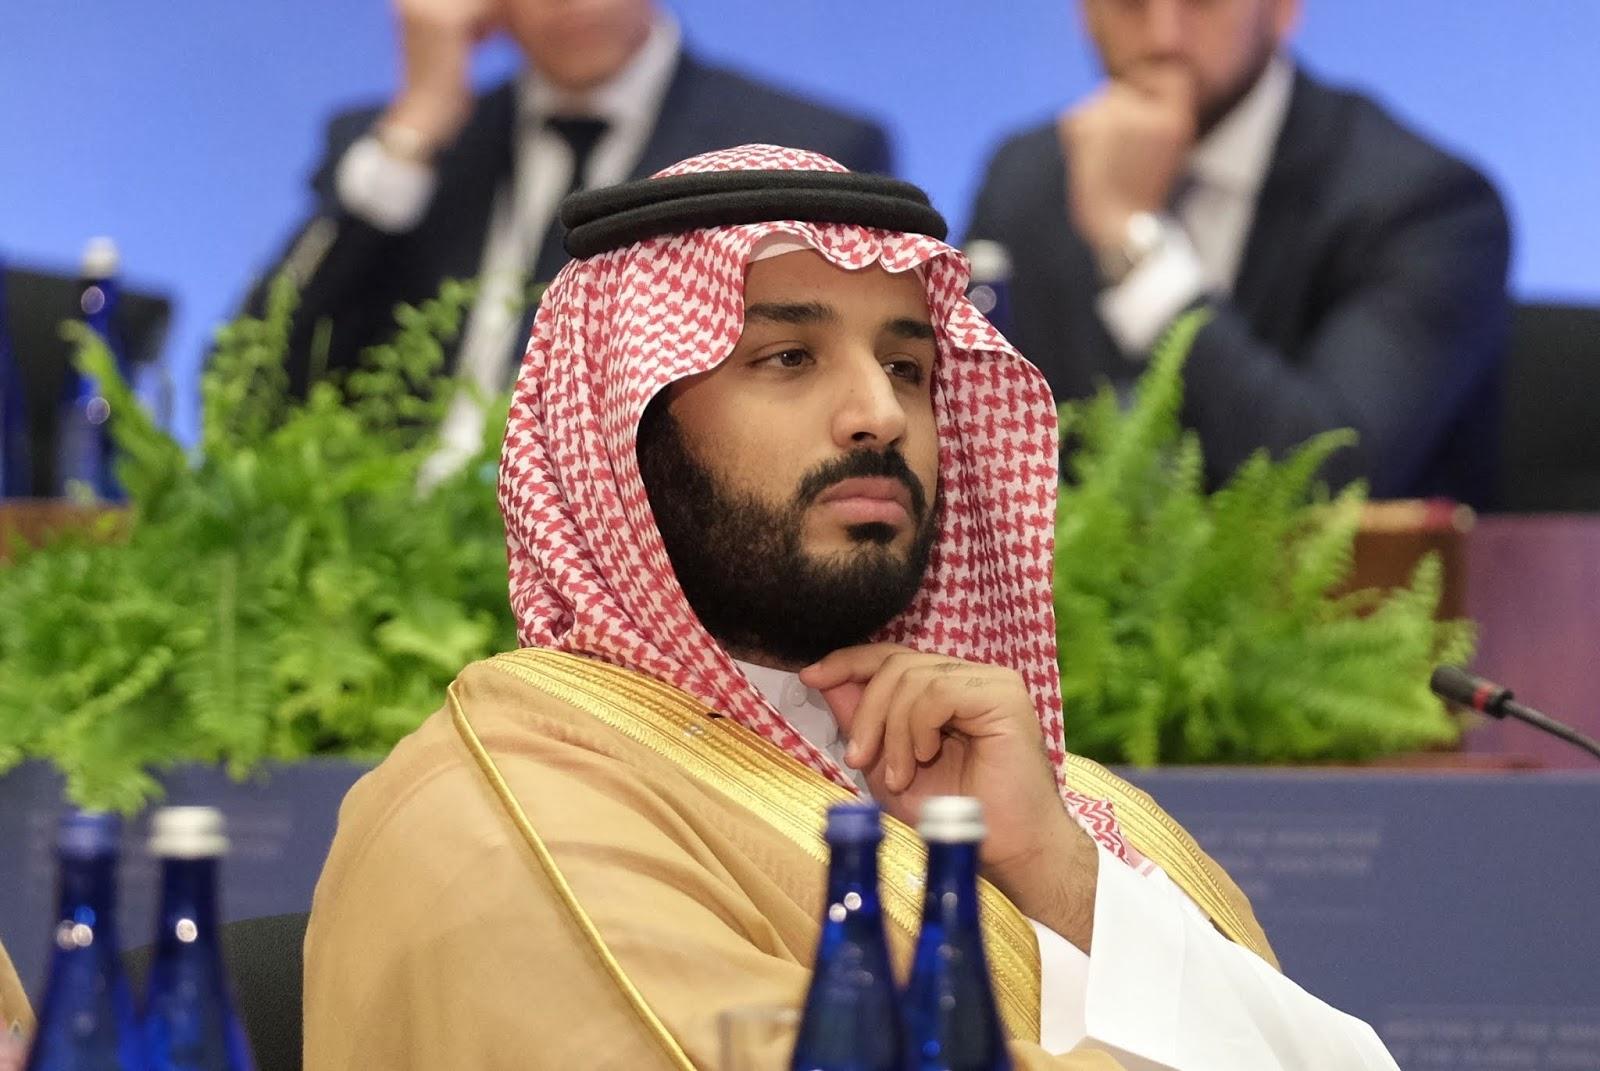 CIA Says Saudi Crown Prince Behind Khashoggi Murder: Reports